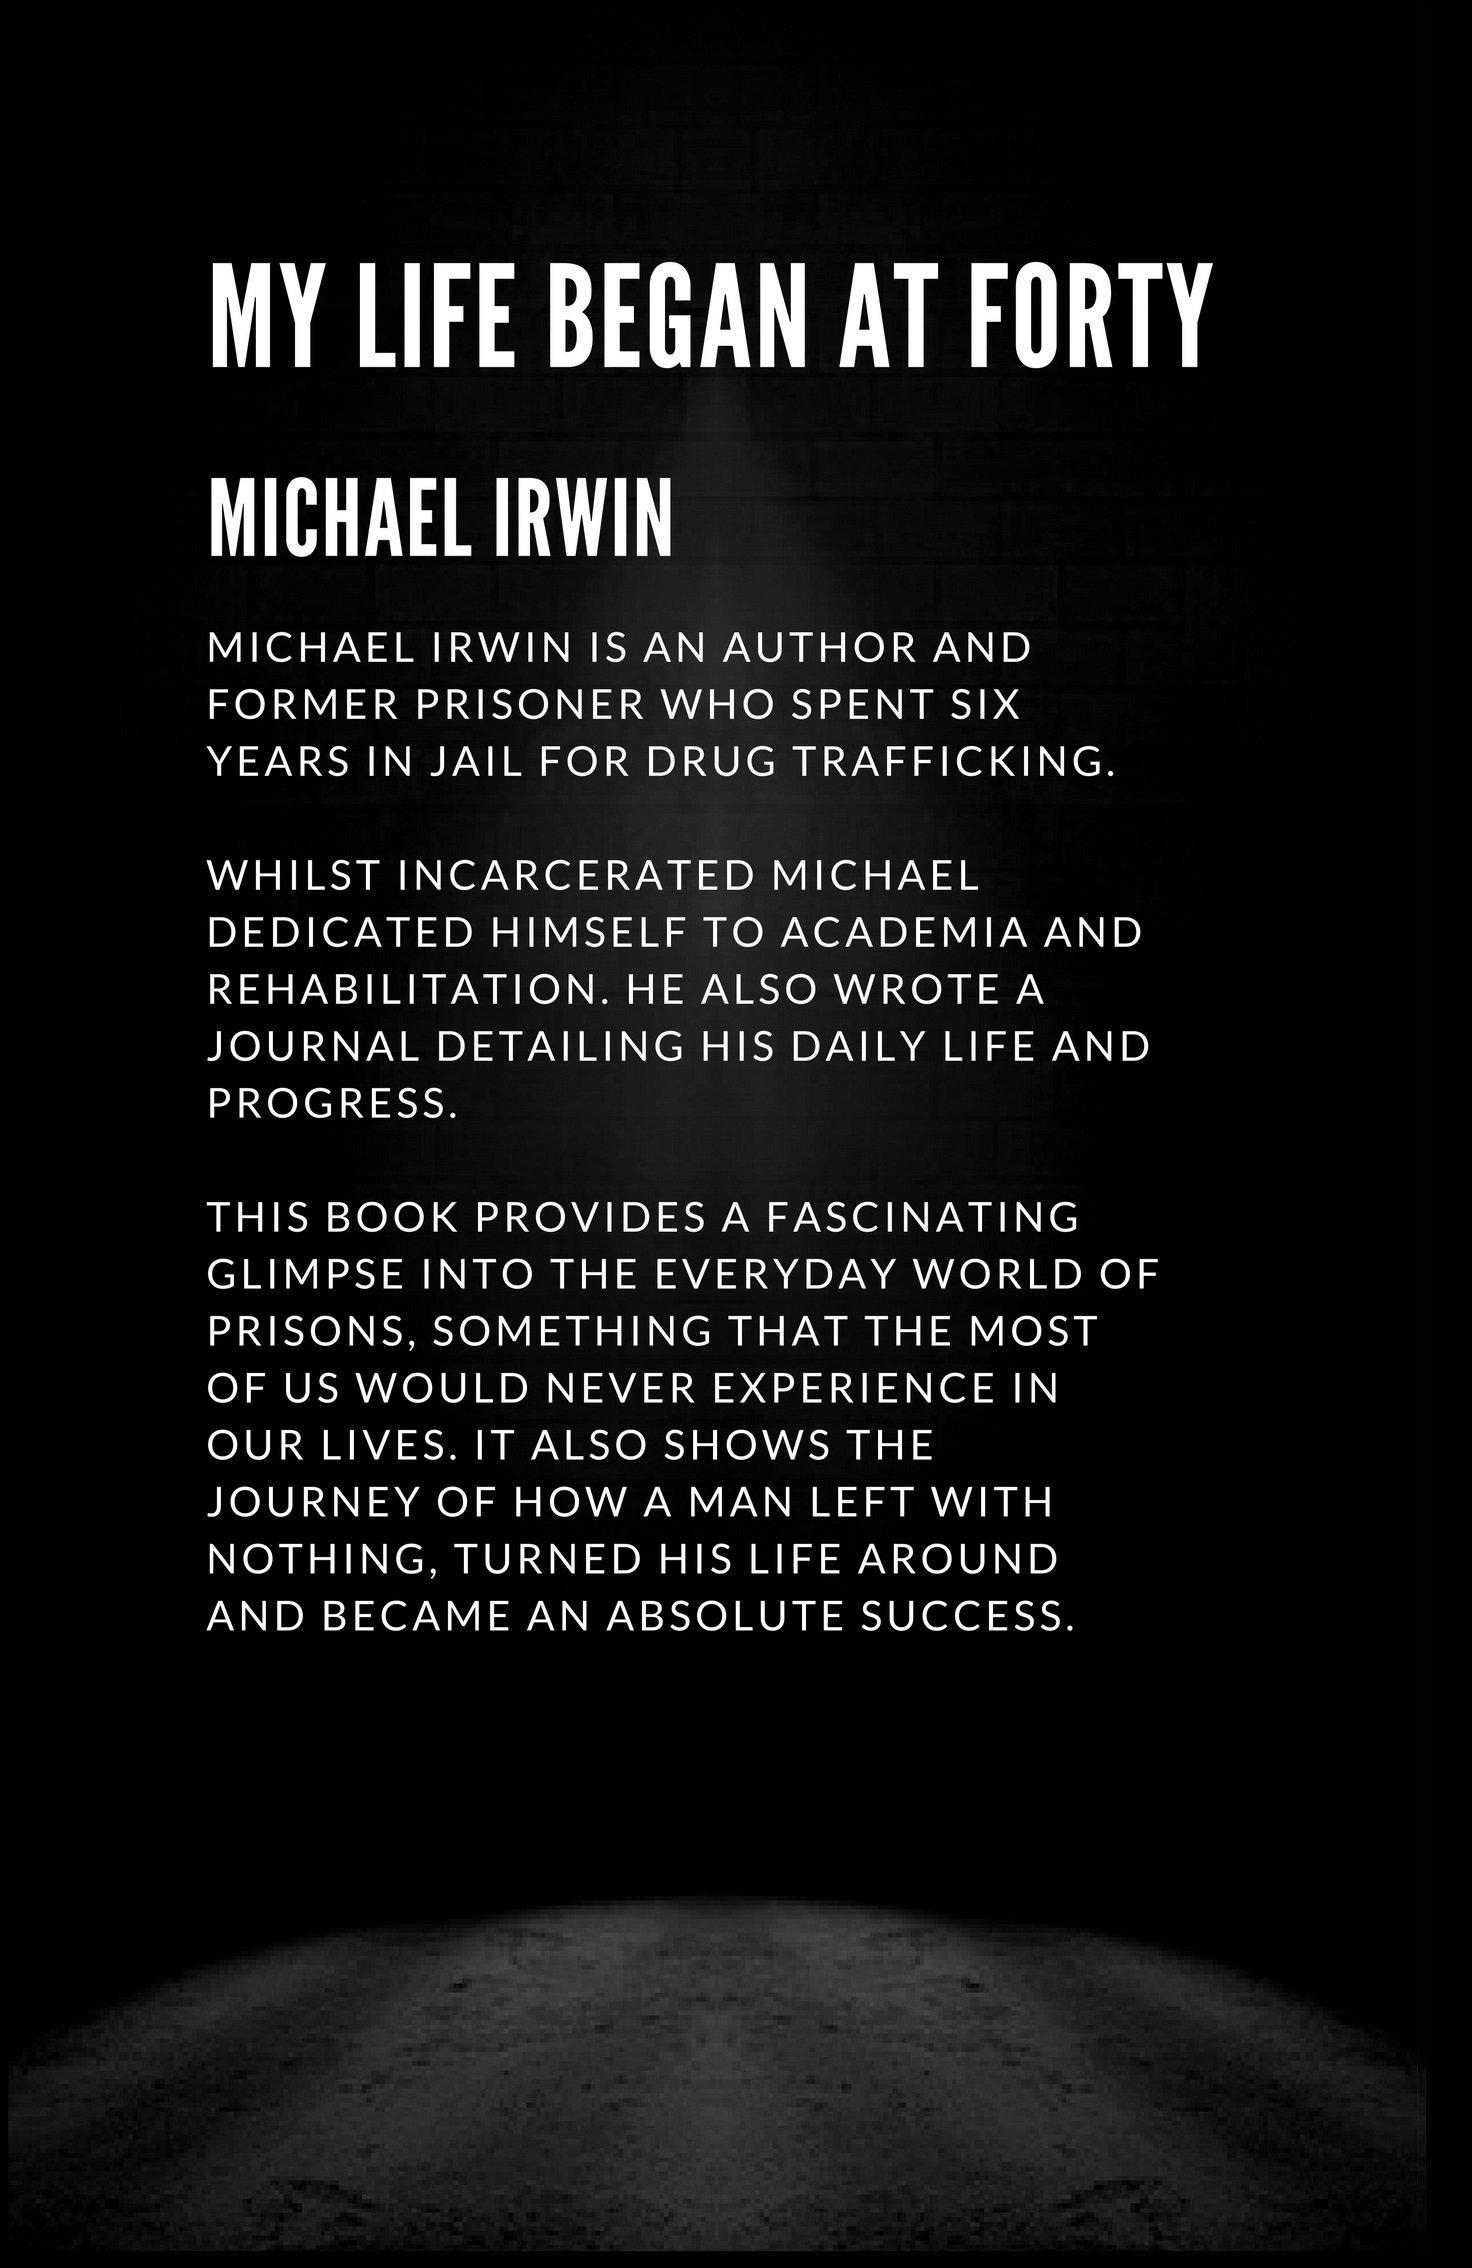 MY LIFE BEGAN AT FORTY - MICHAEL IRWIN - ISBN 9780992903763